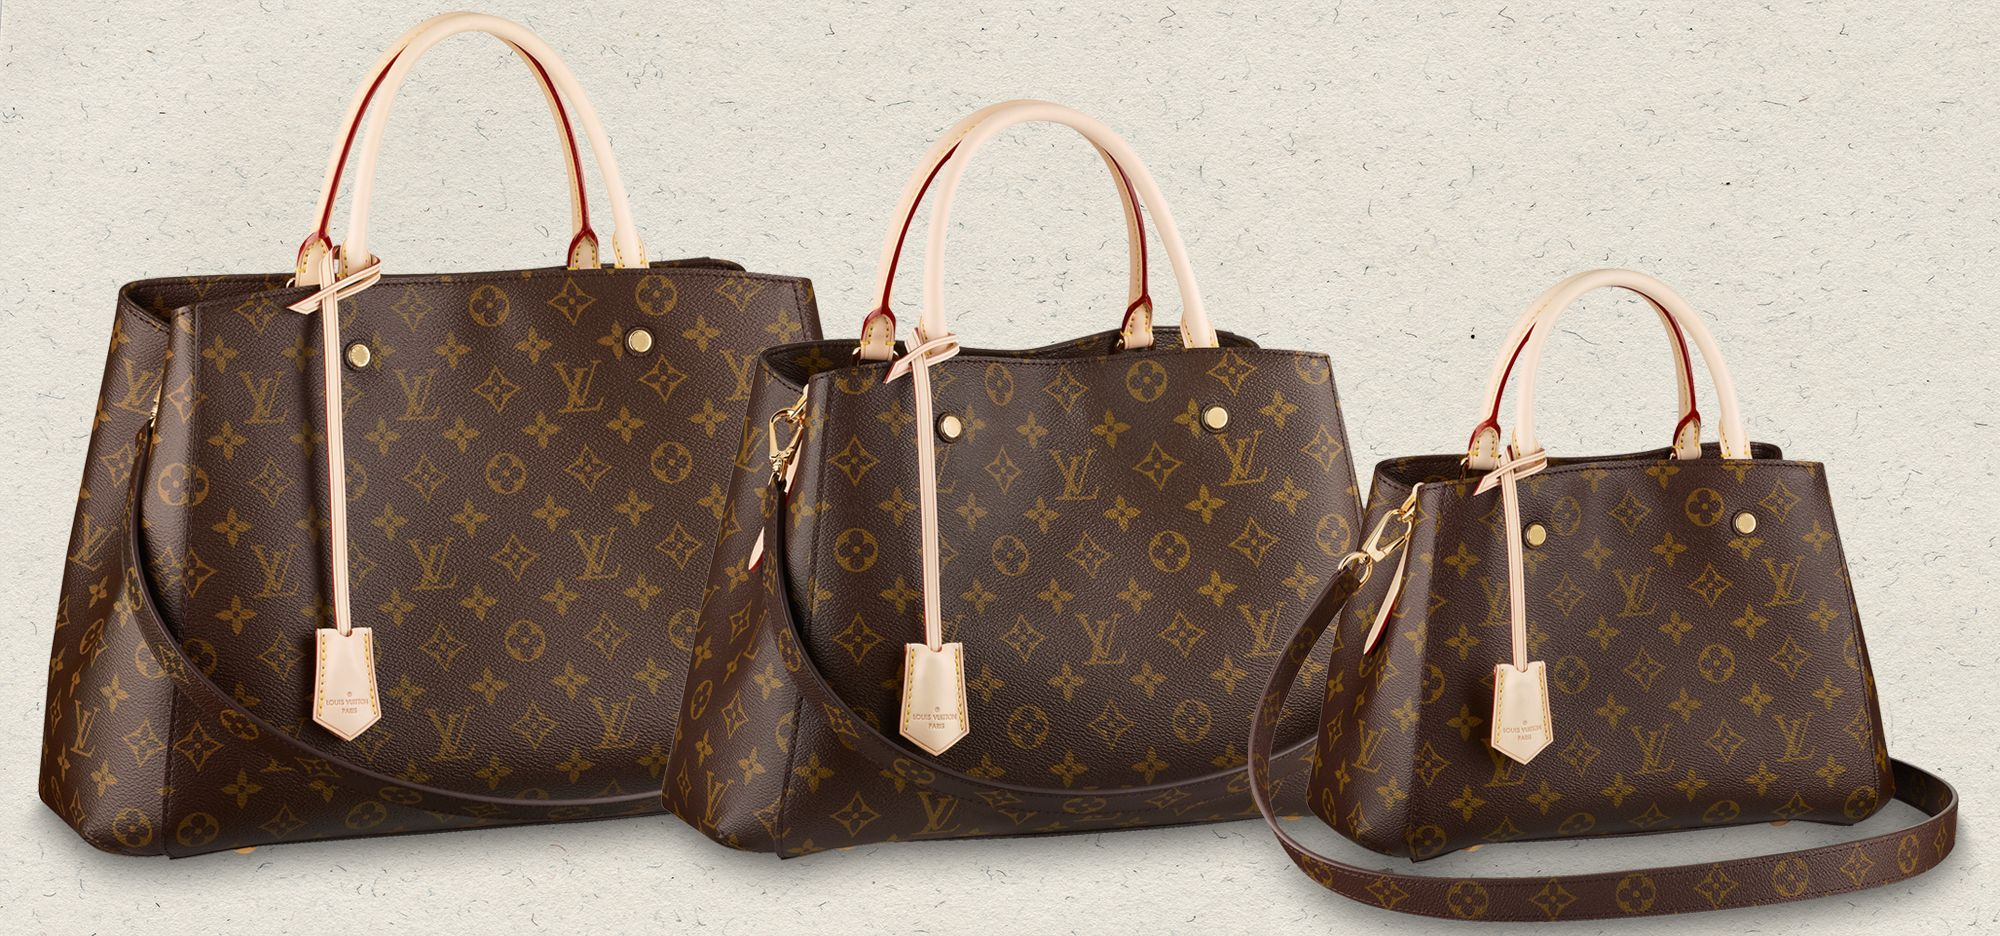 a1596e14c1f6 Cheap Designer Replica Louis Vuitton Monogram Handbags Online Store ...